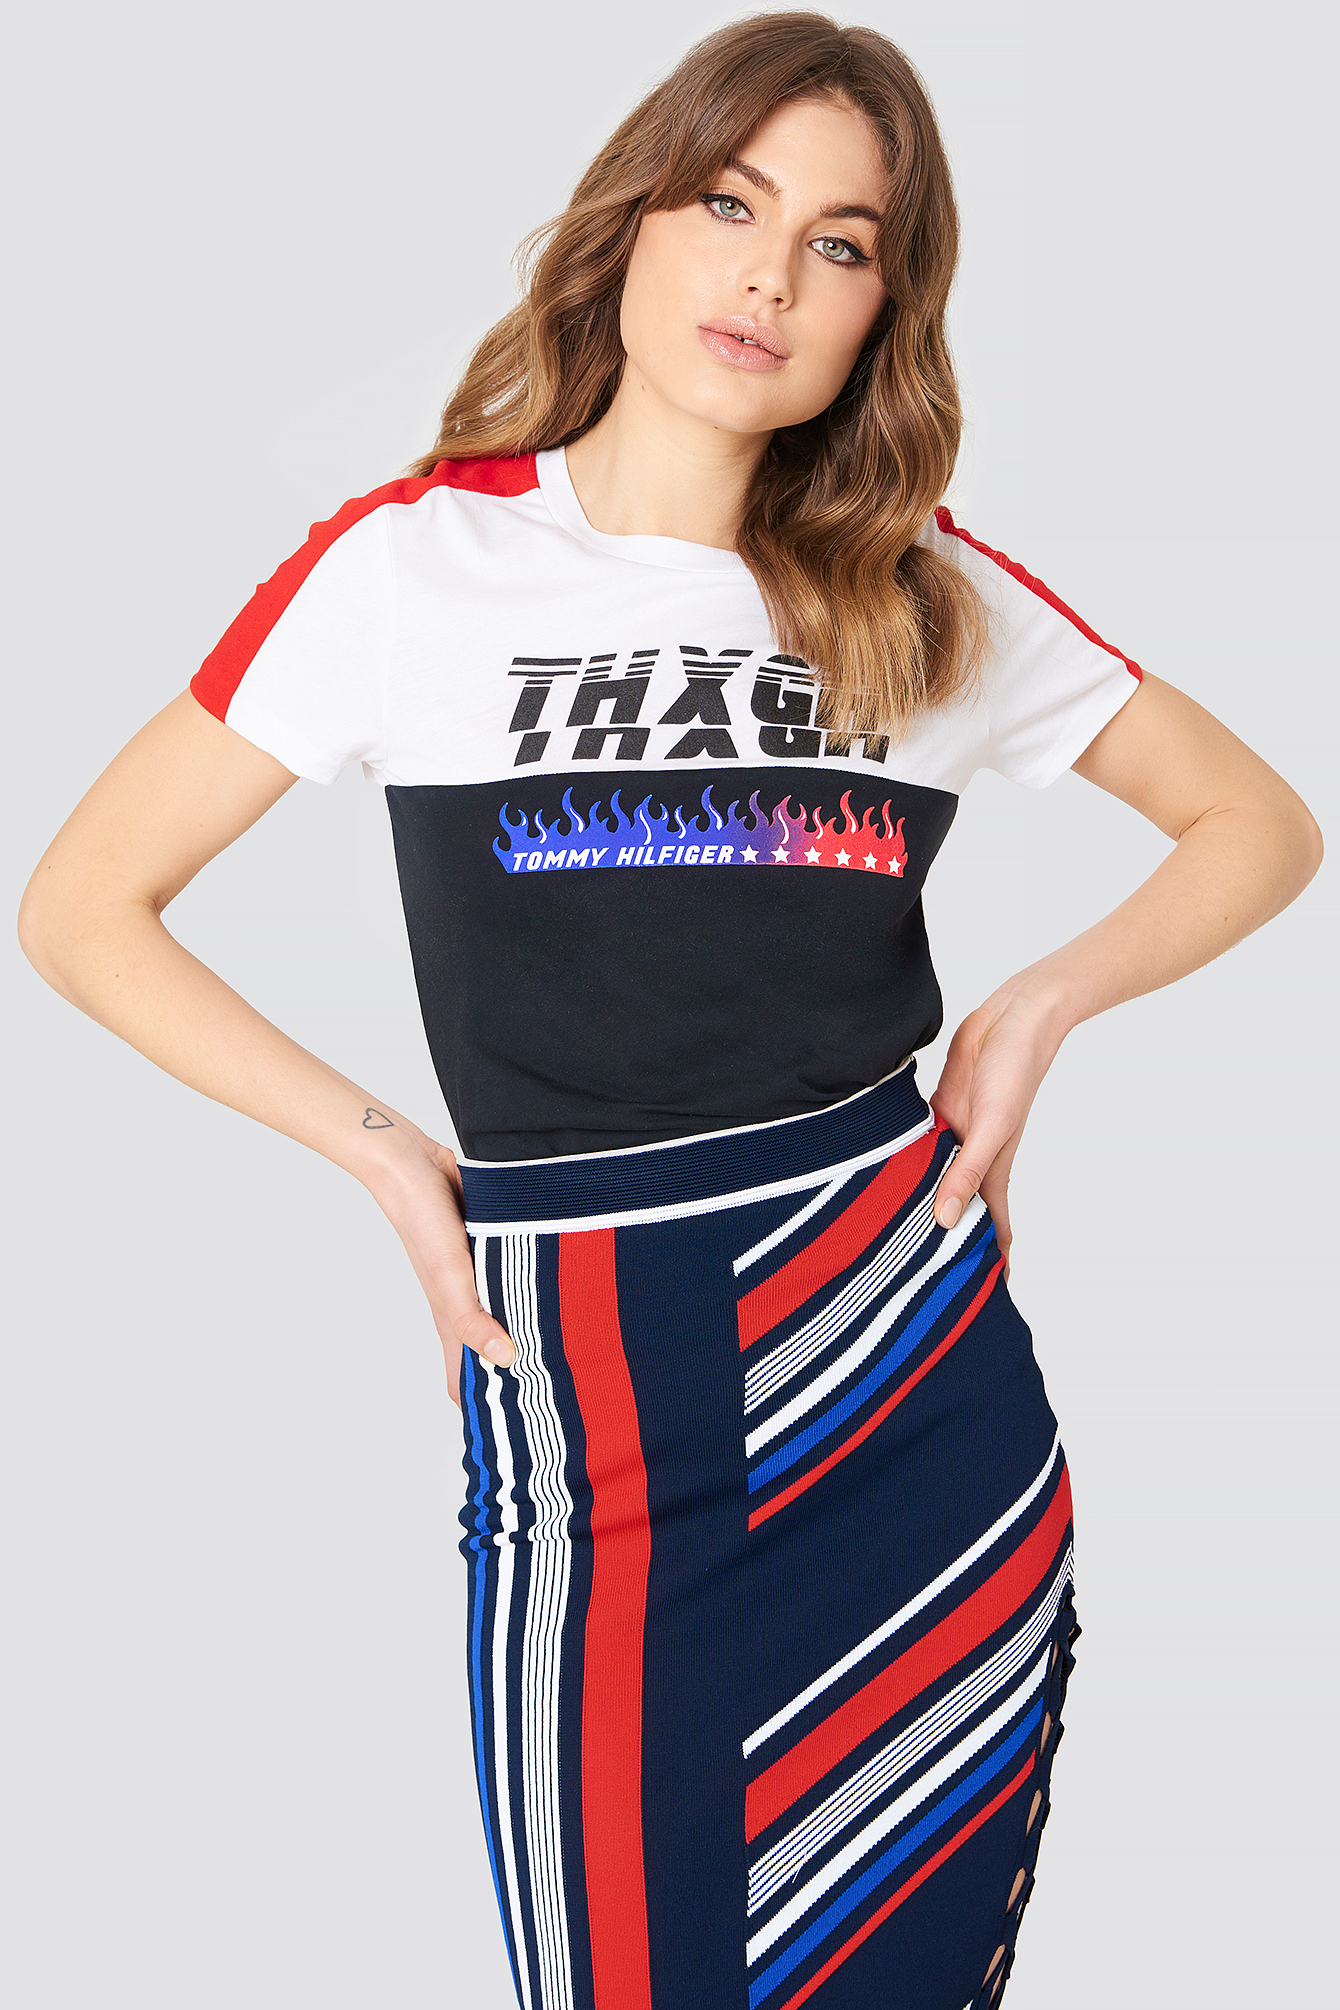 0fe2bc6115073 Tommy Hilfiger Gigi Hadid Speed Ss T-Shirt - Multicolor